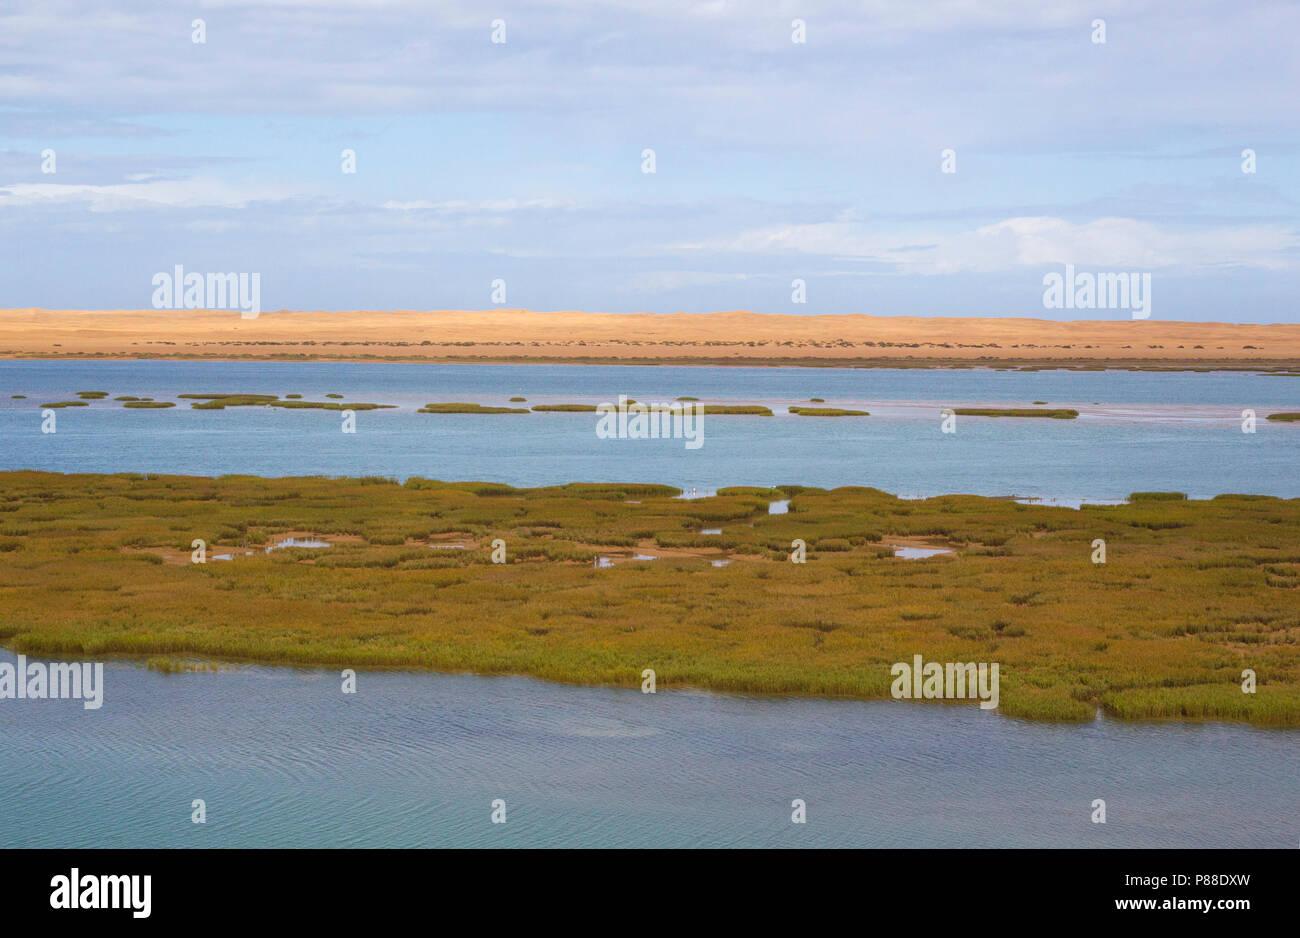 Khenifiss National Park, Khenifiss National Park - Stock Image